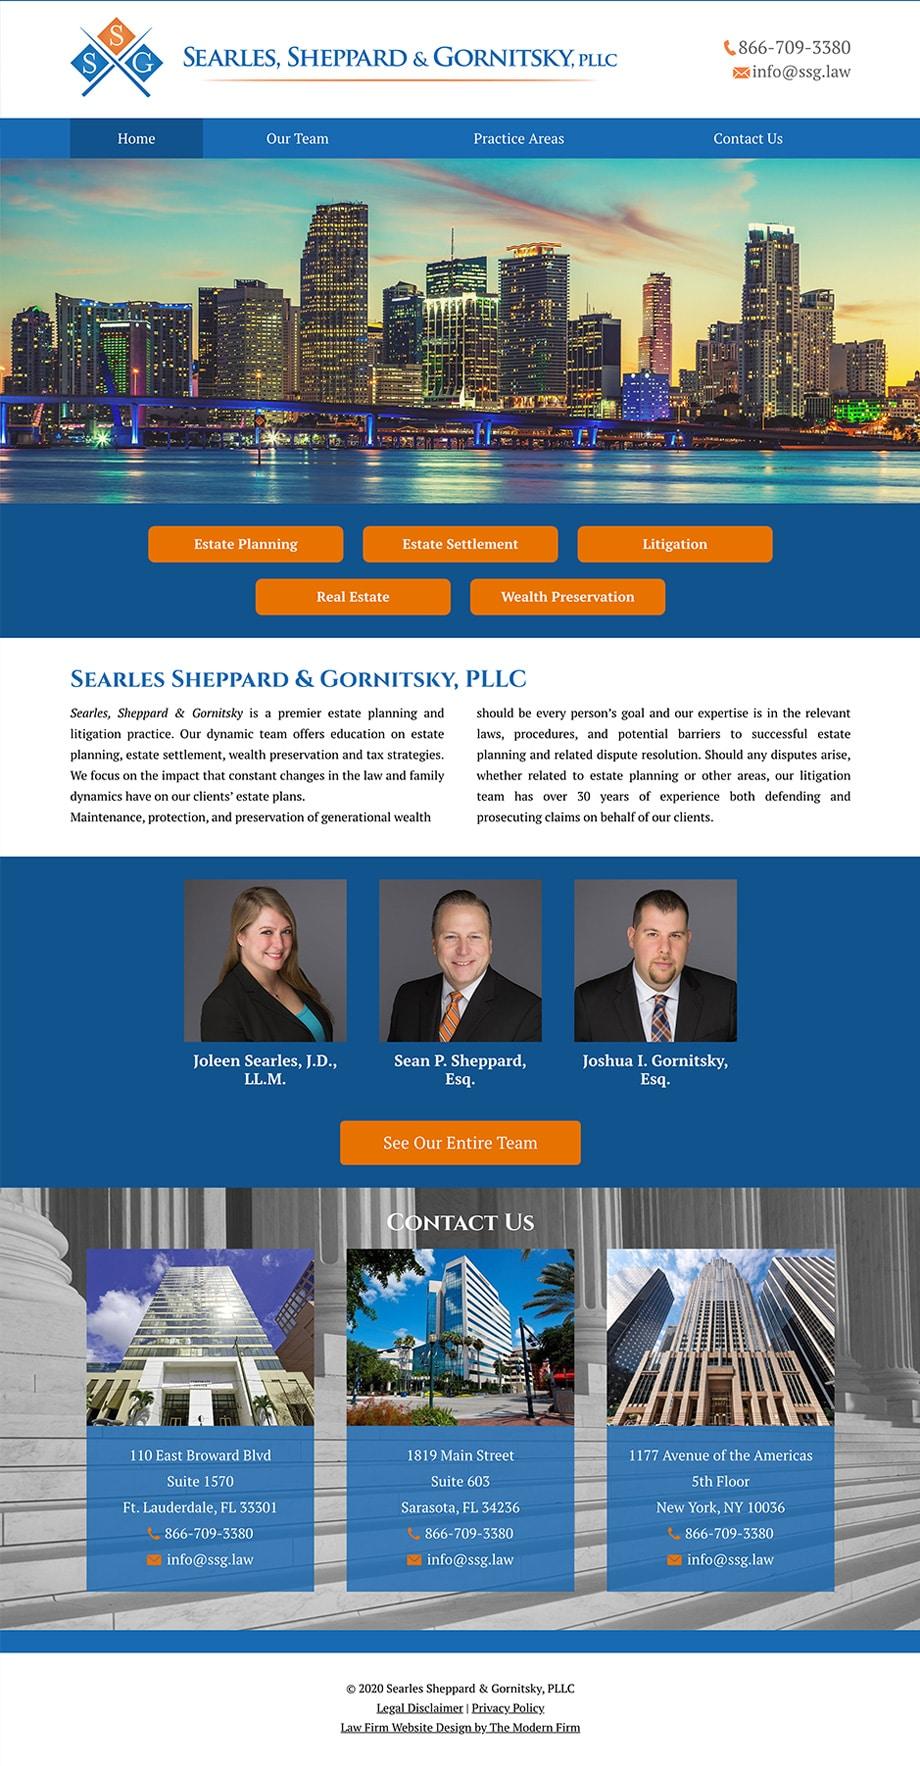 Law Firm Website Design for Searles Sheppard & Gornitsky, PLLC